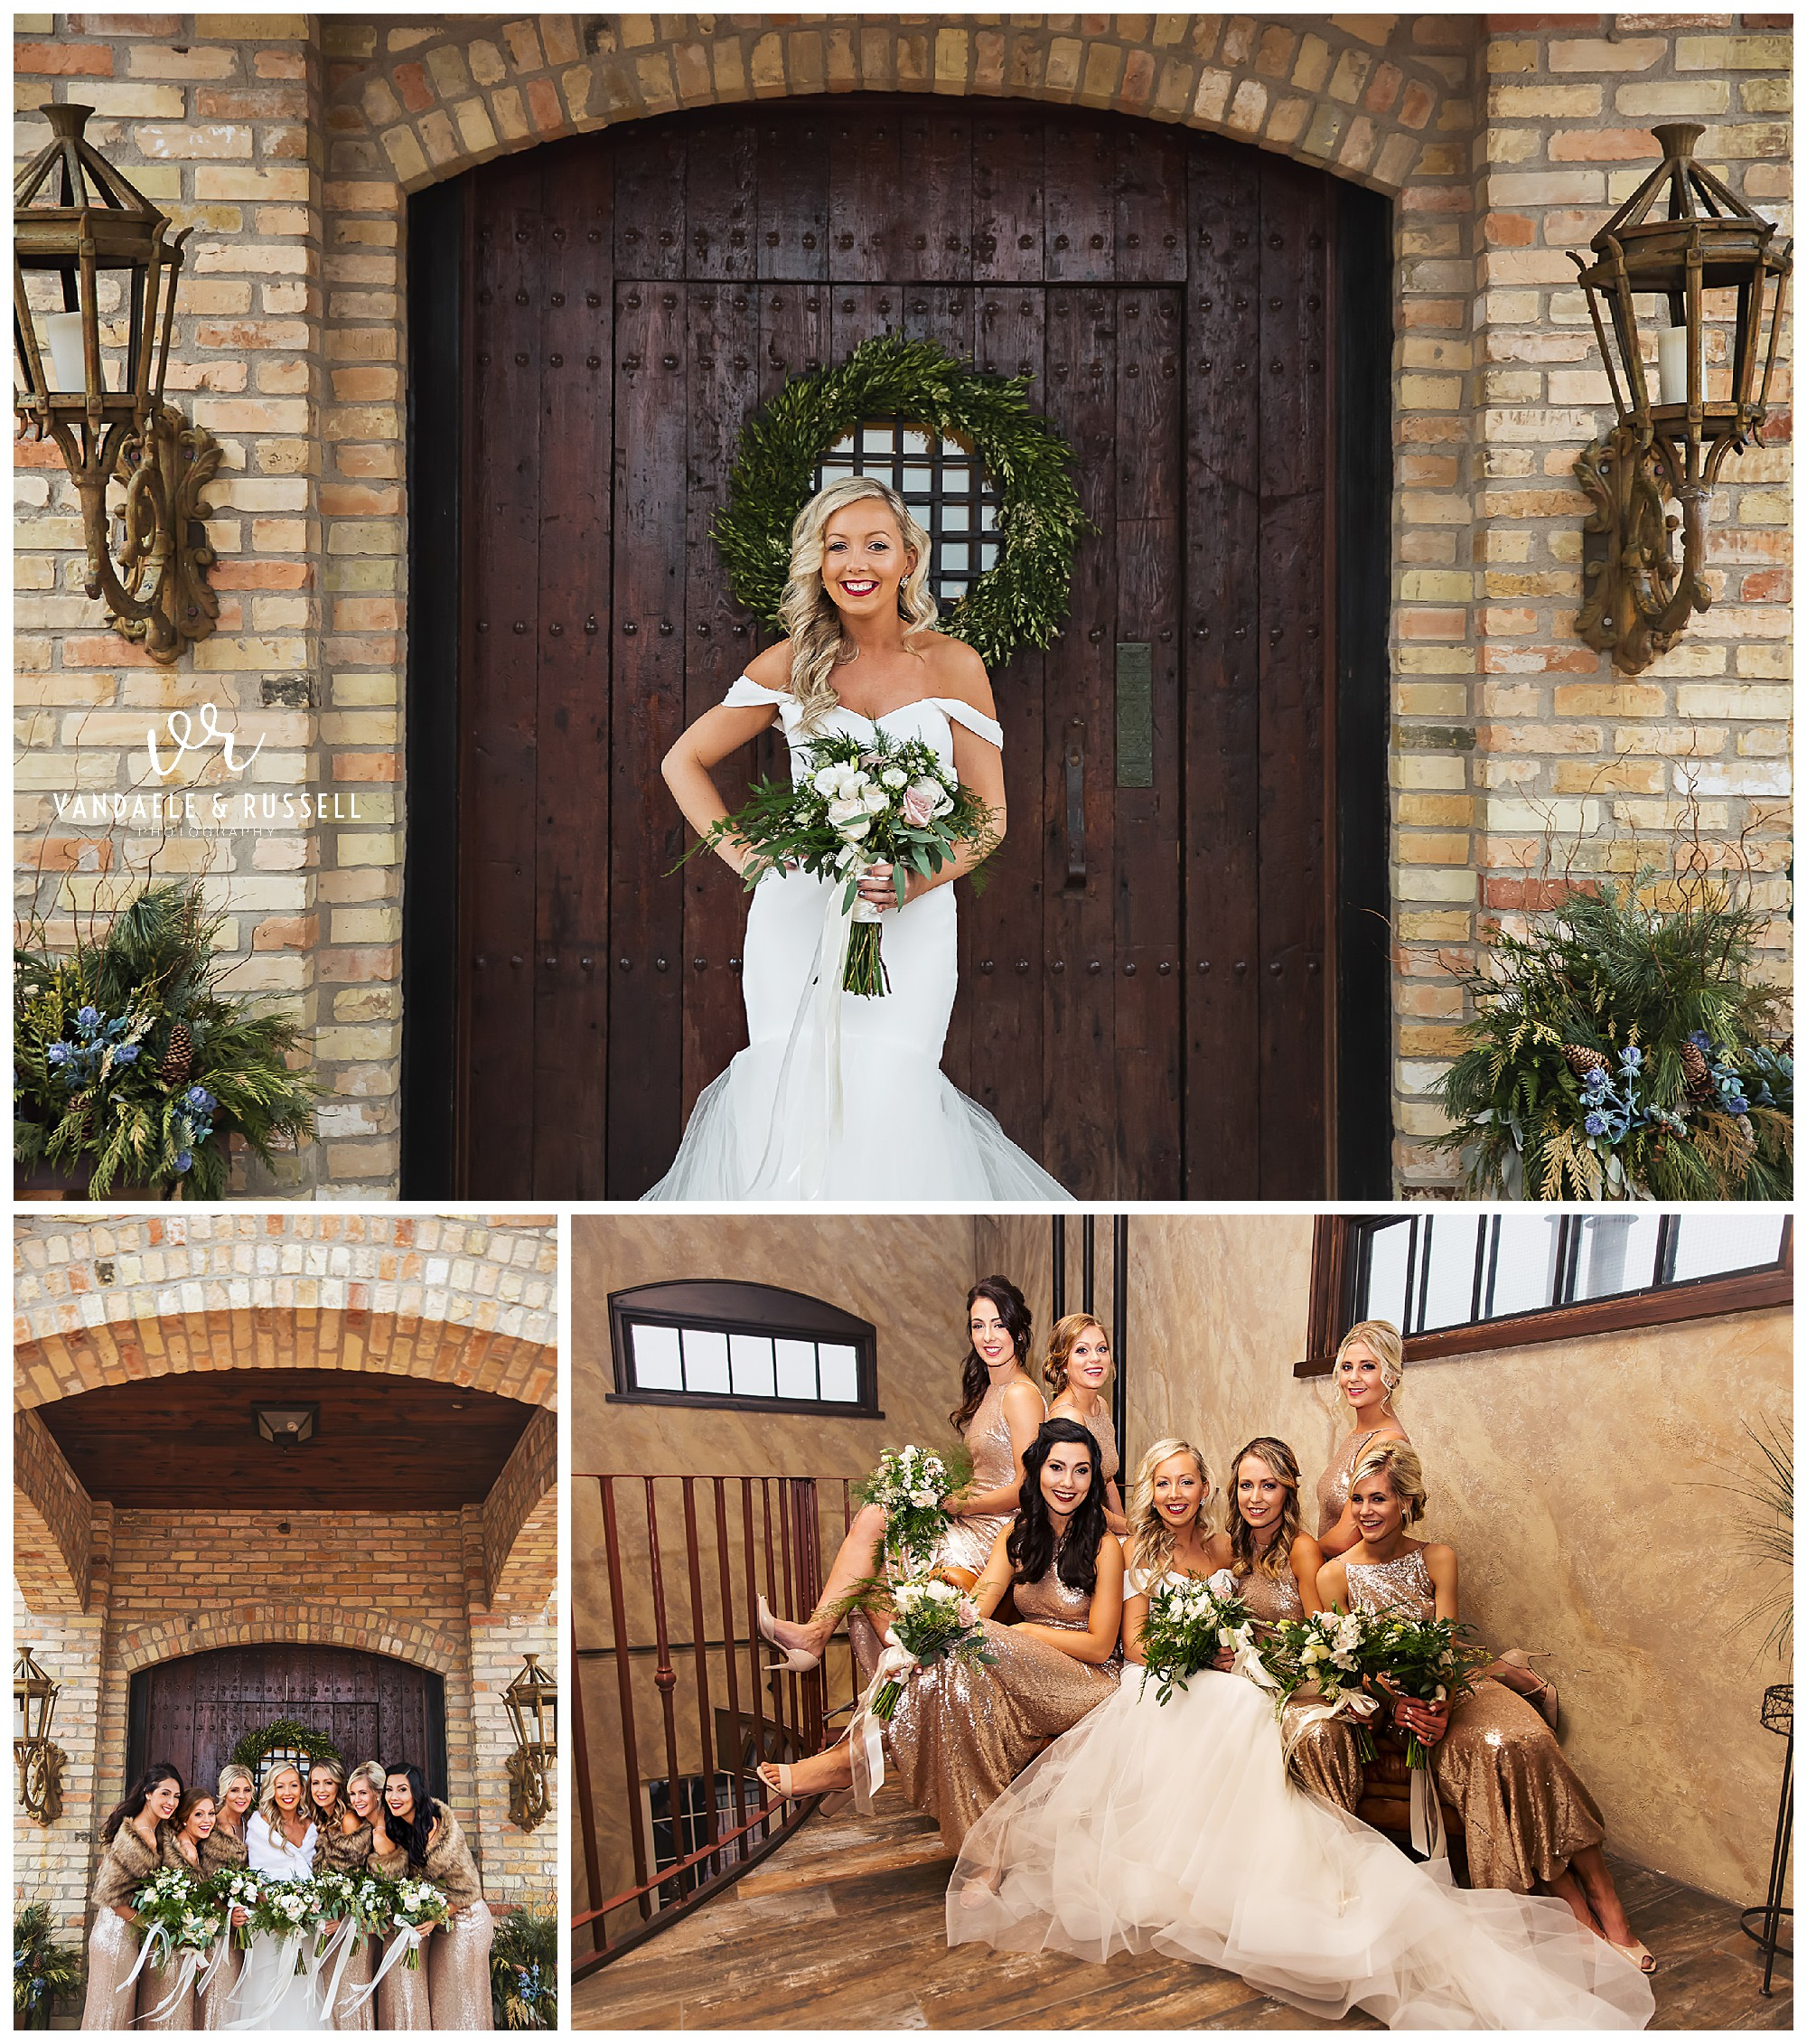 Hacienda-Sarria-Wedding-Photos-NYE-Michelle-Matt-VanDaele-Russell_0023.jpg